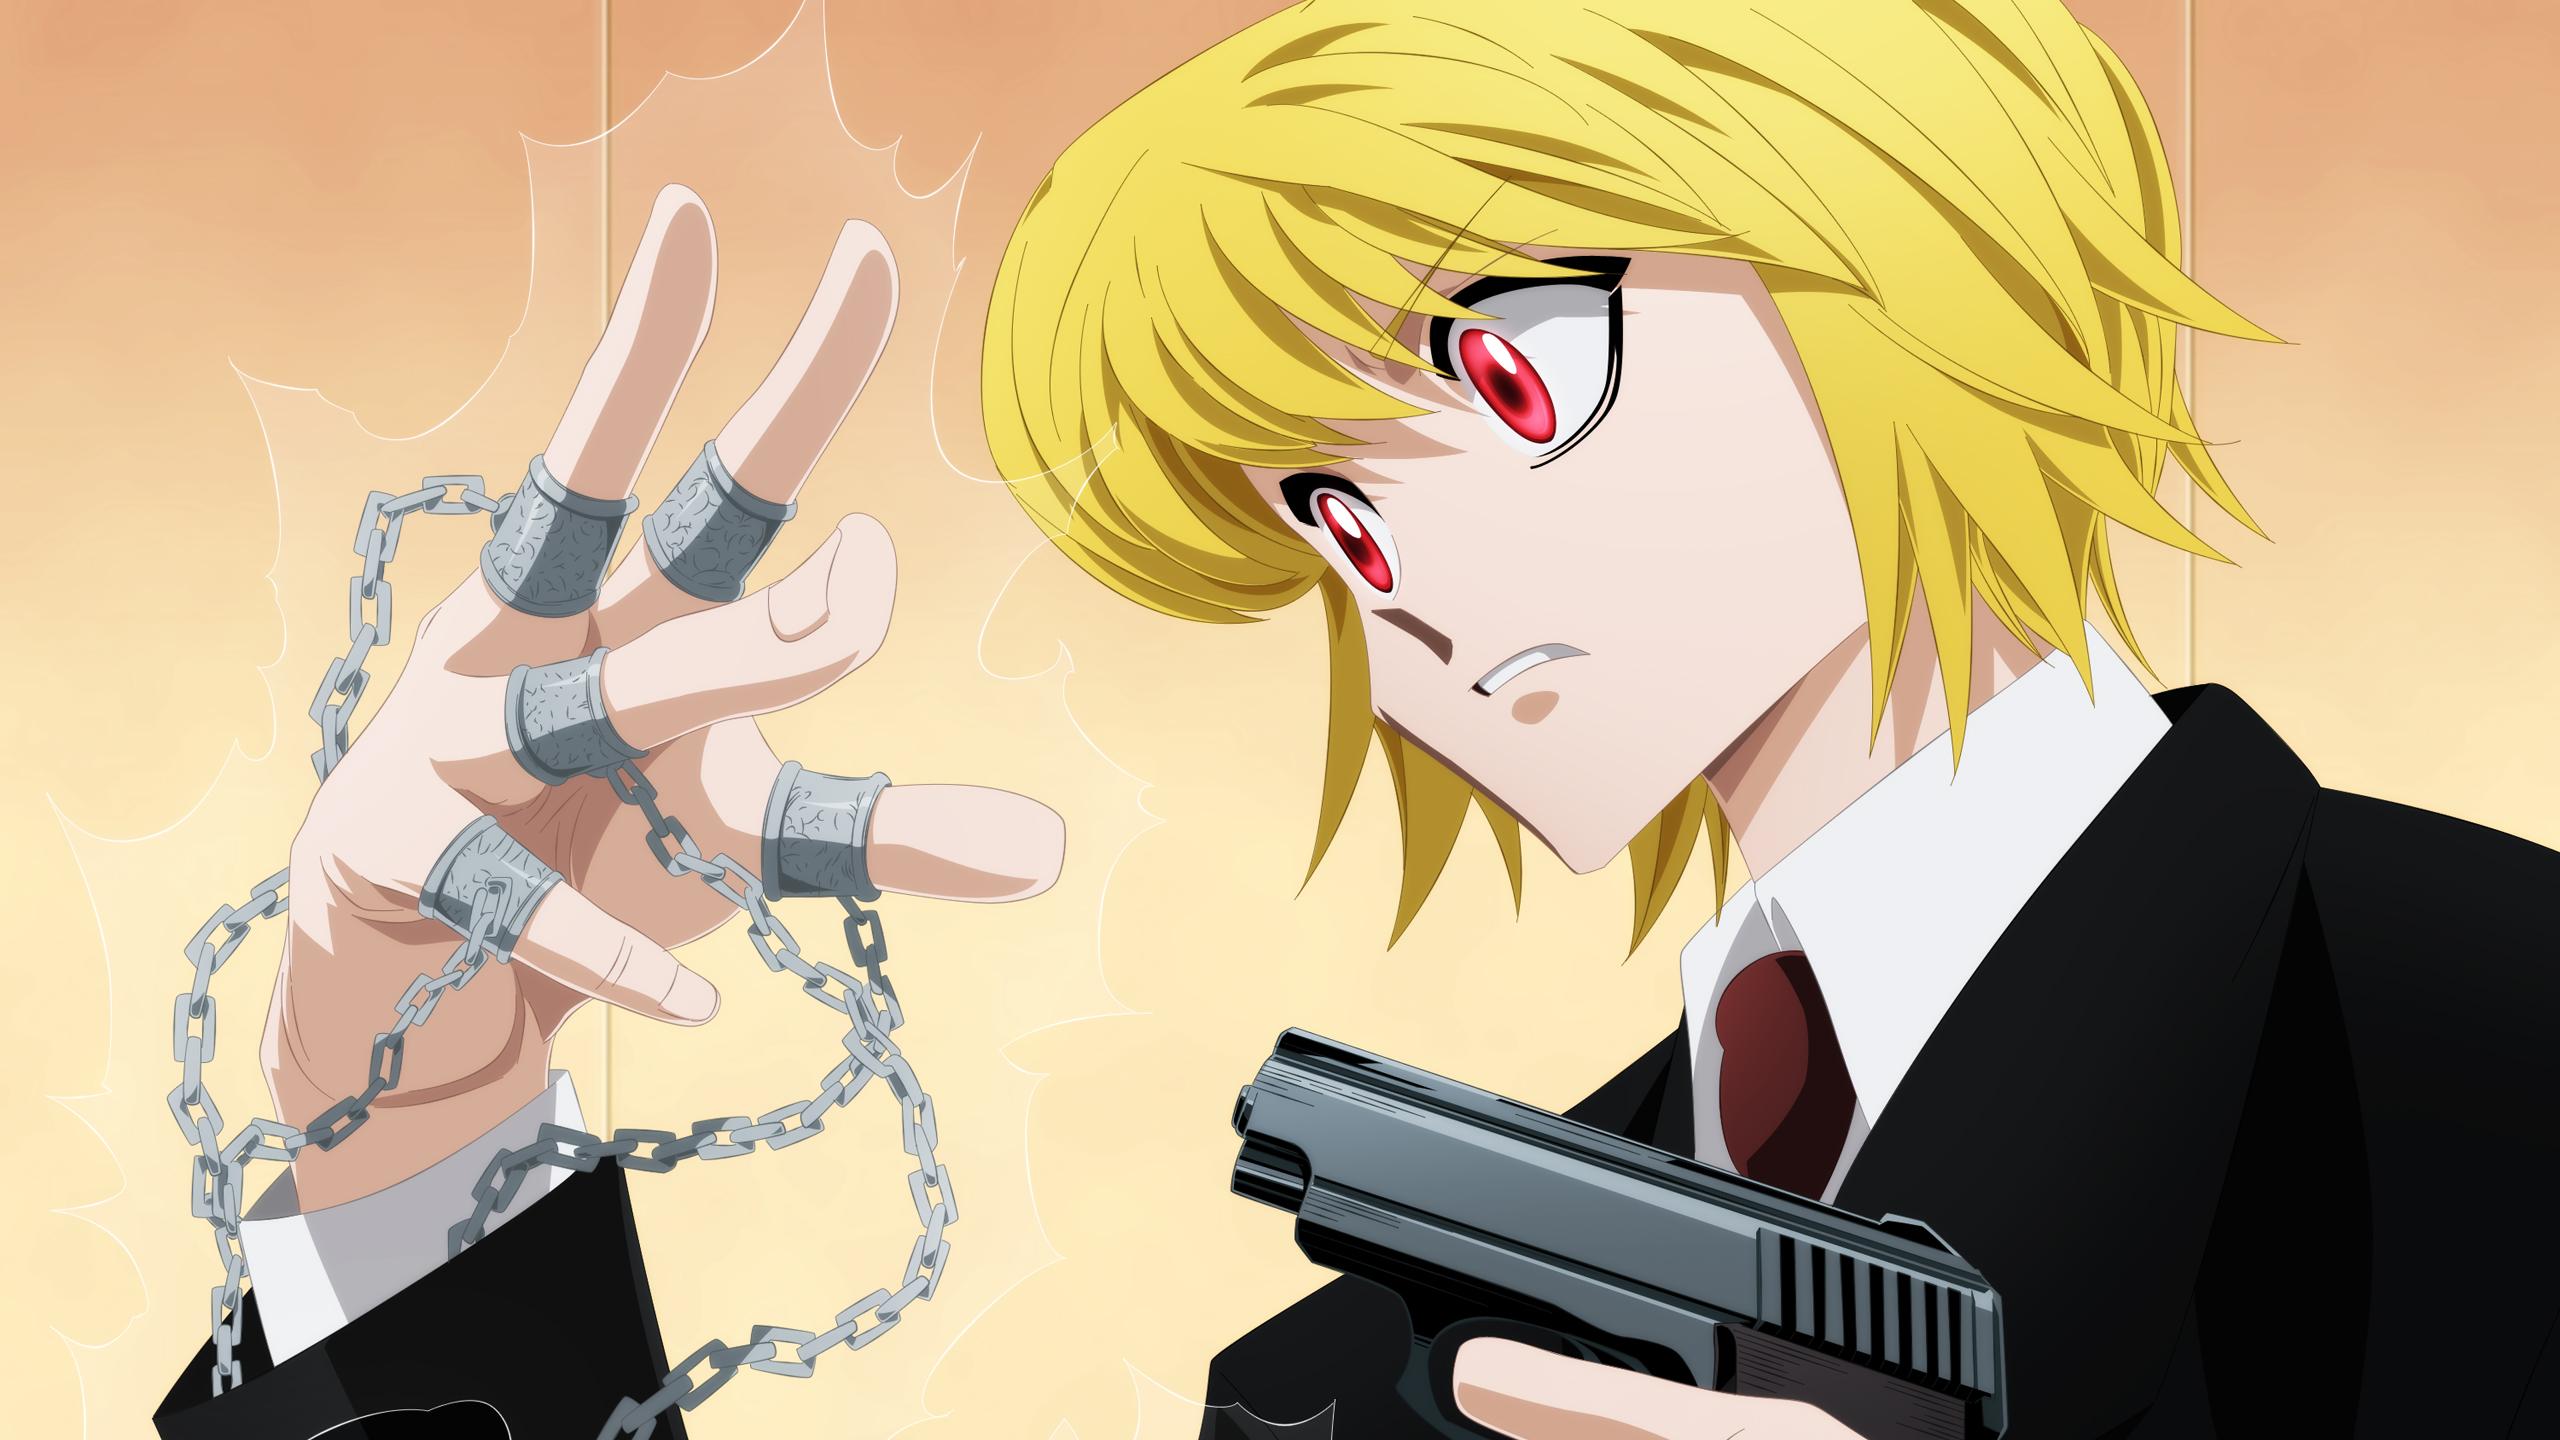 Hunter x hunter wallpapers ♡. Hunter x Hunter Kurapika HD Anime Wallpapers | HD ...